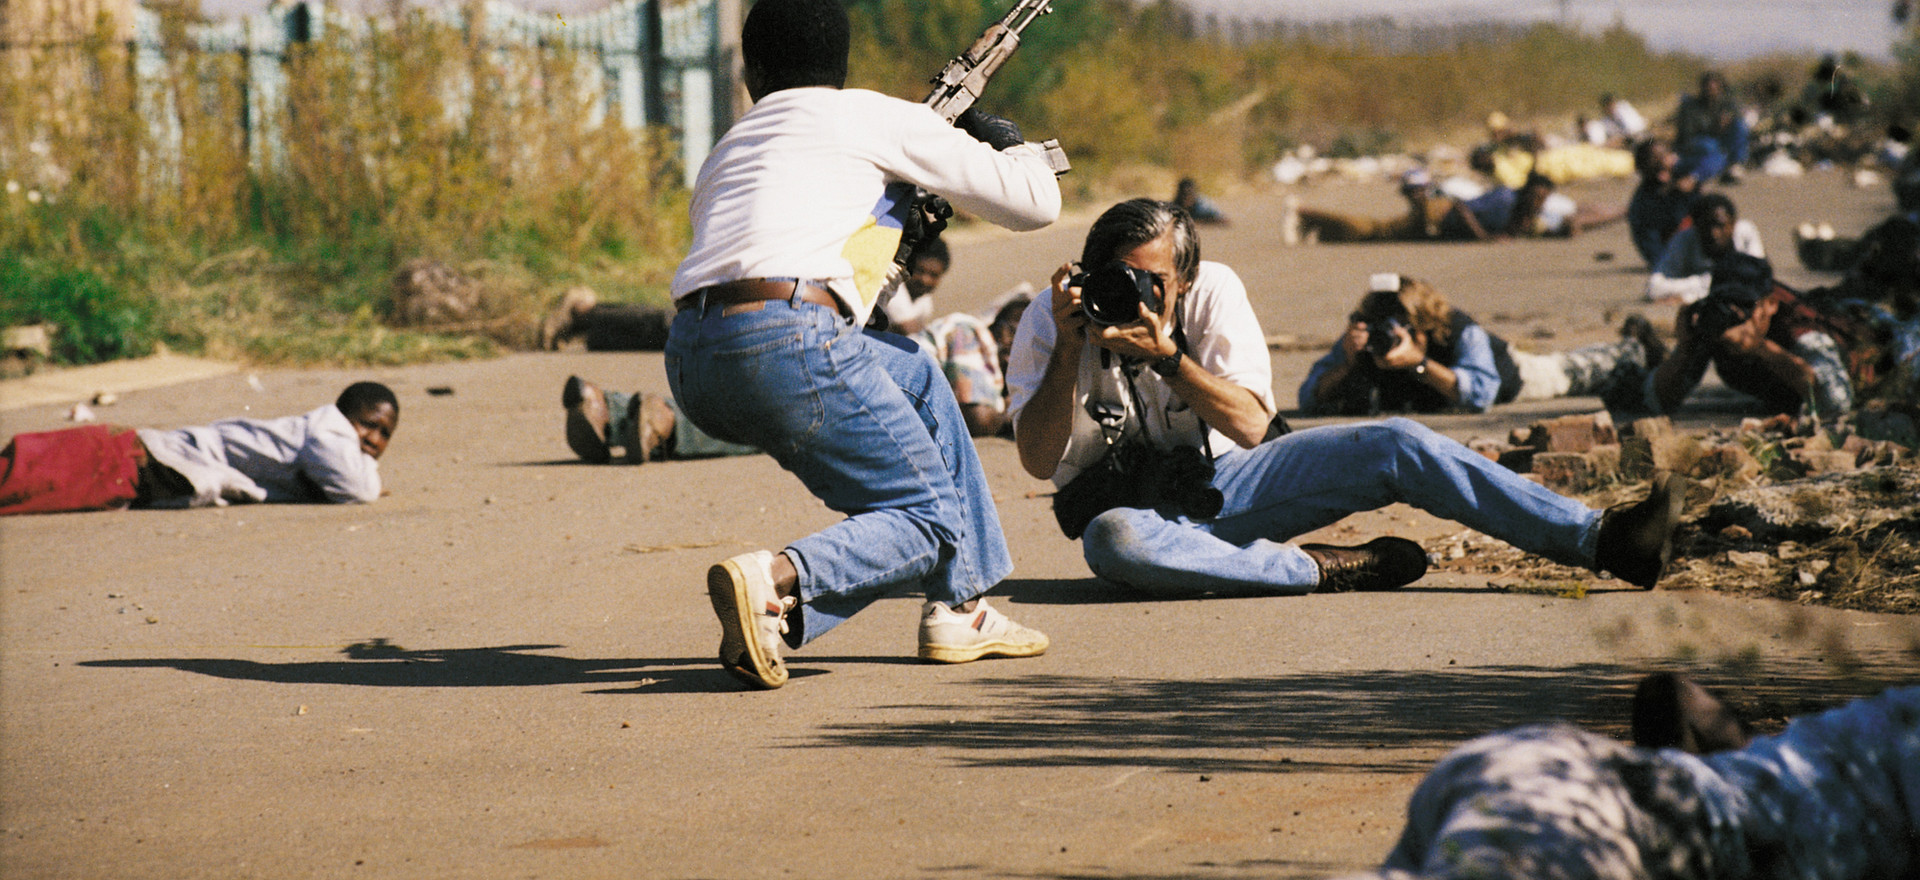 WarPhotographer_2001_ChristianFrei.jpg